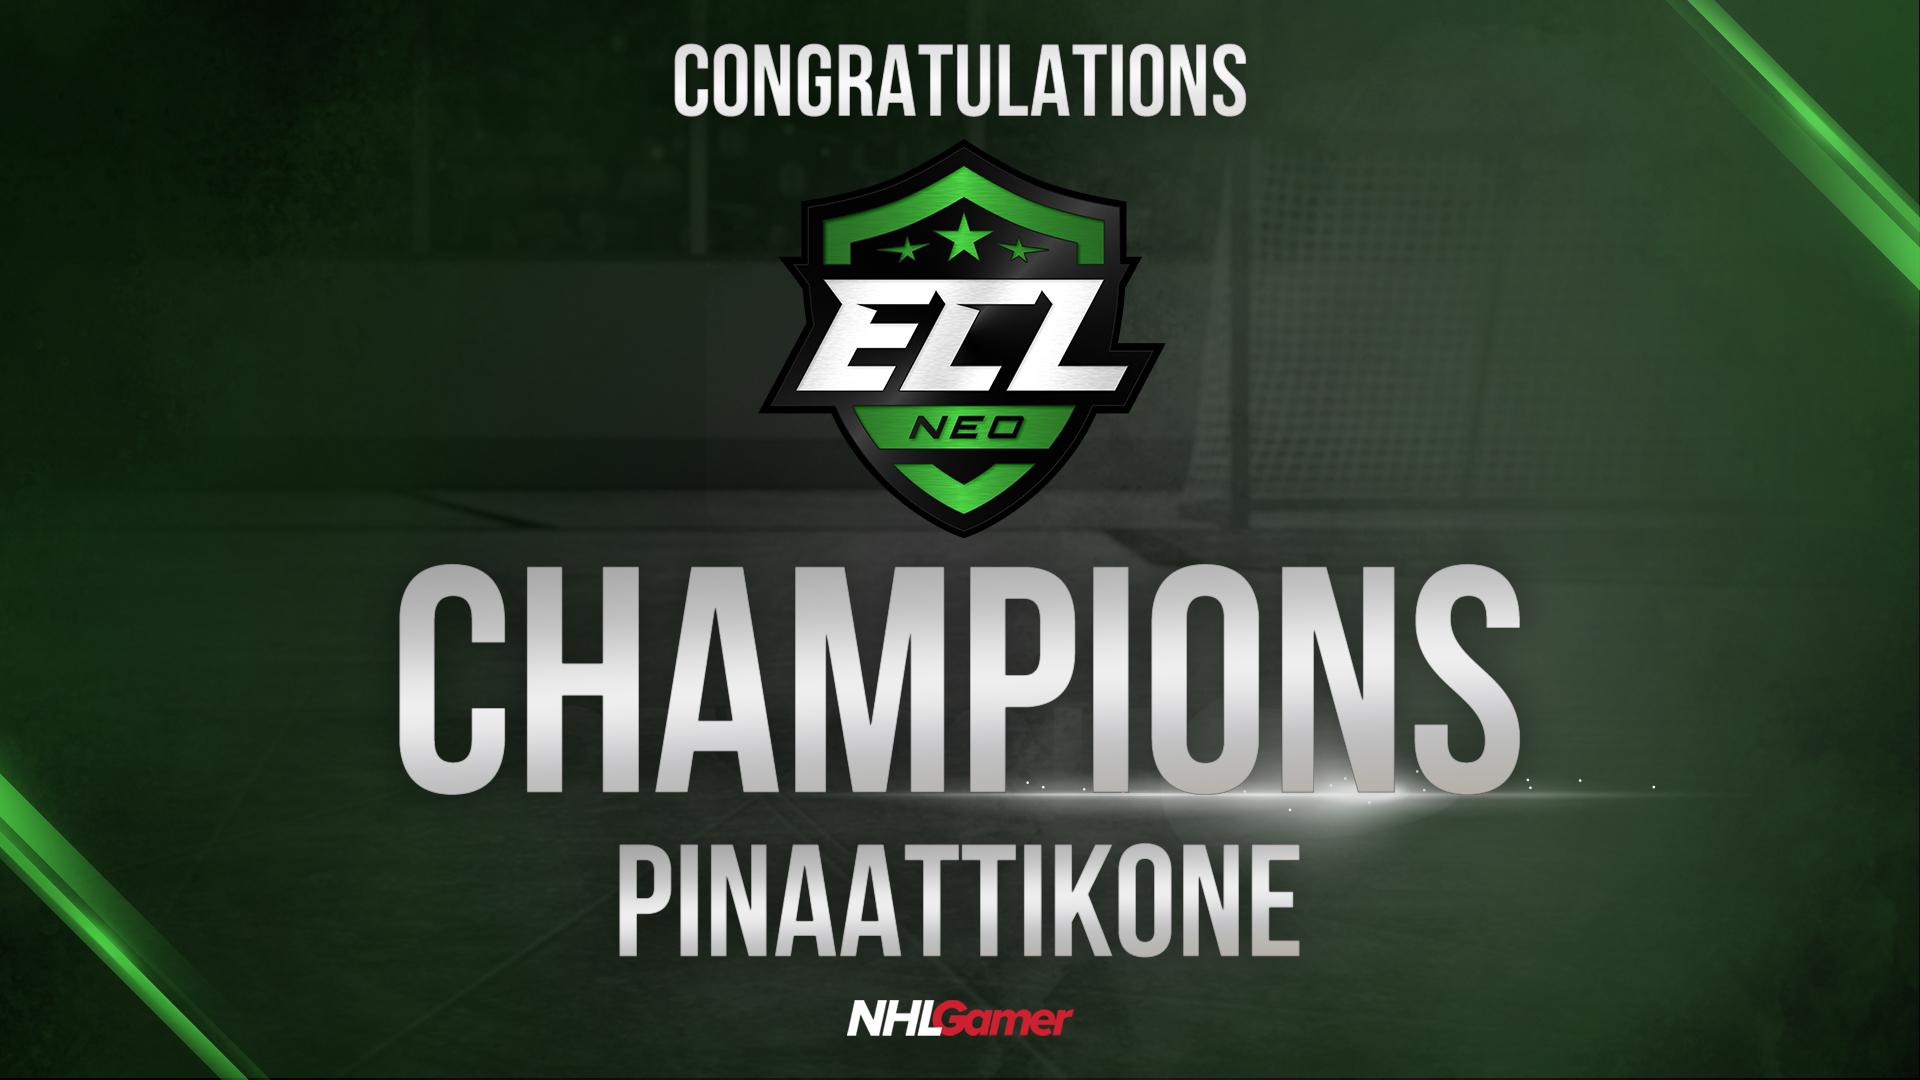 ECL_11_Neo_Champions_Pinaattikone.jpg